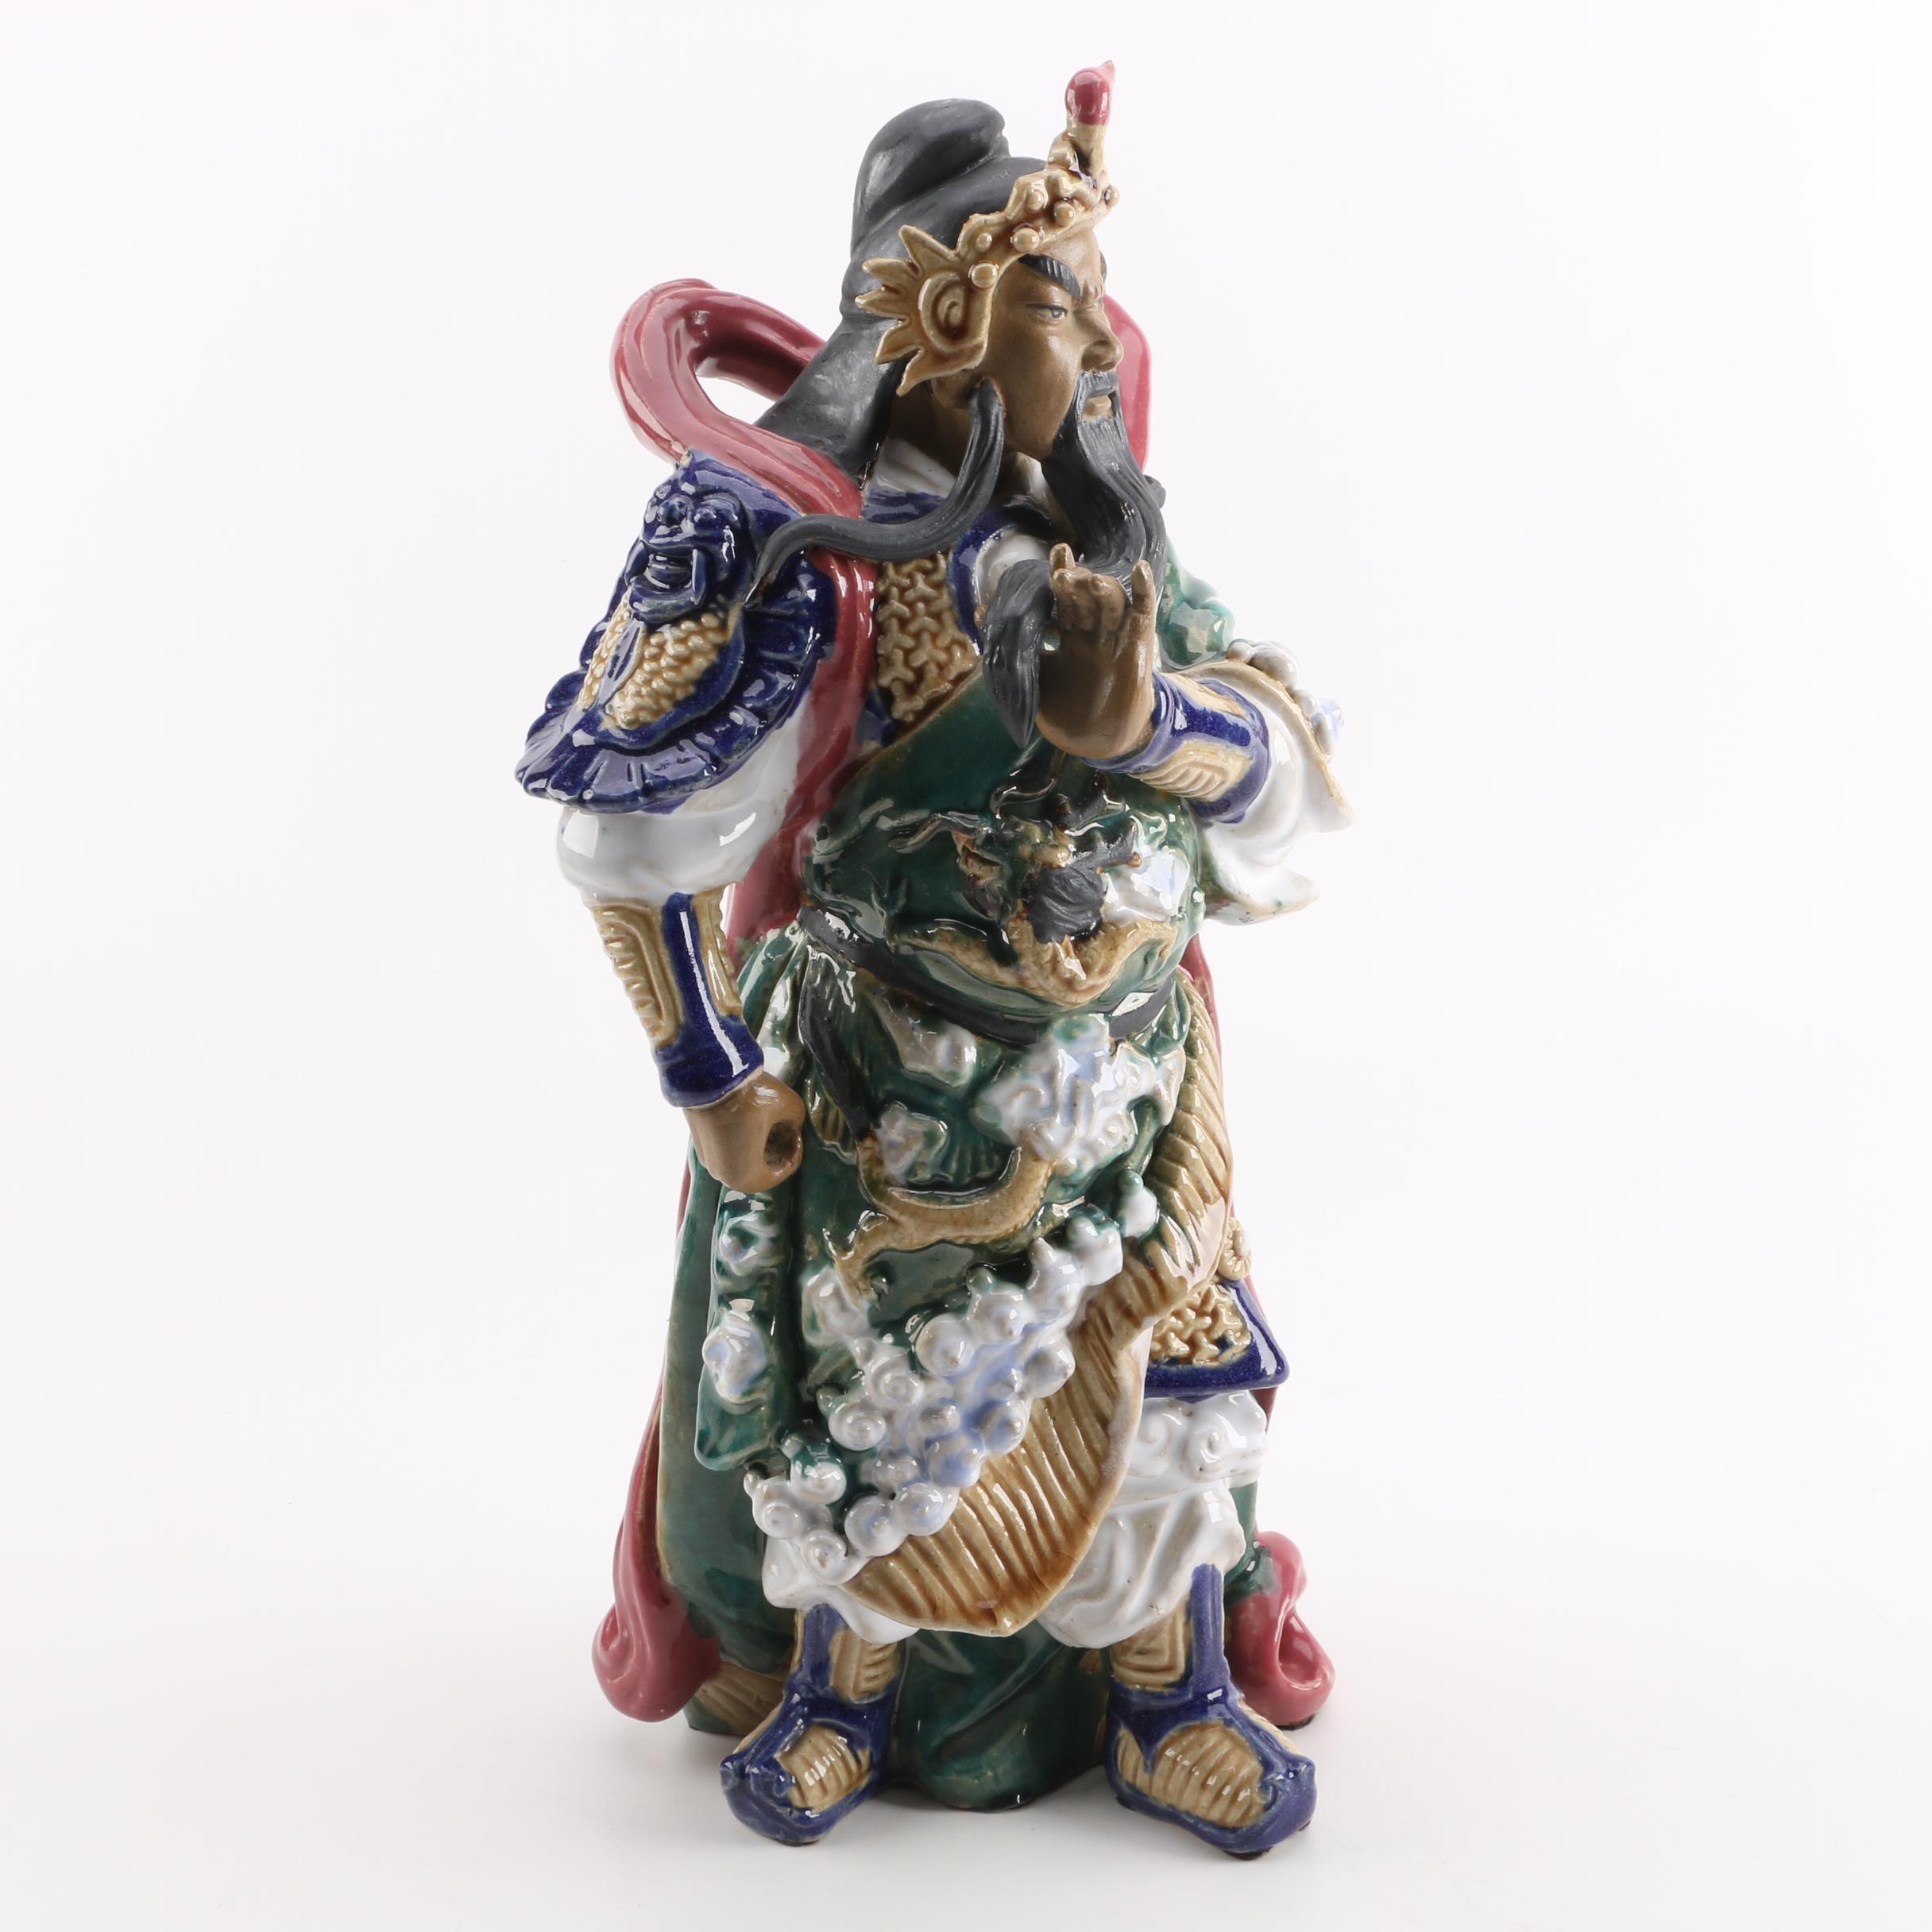 Large Chinese Warrior Ceramic Figurine